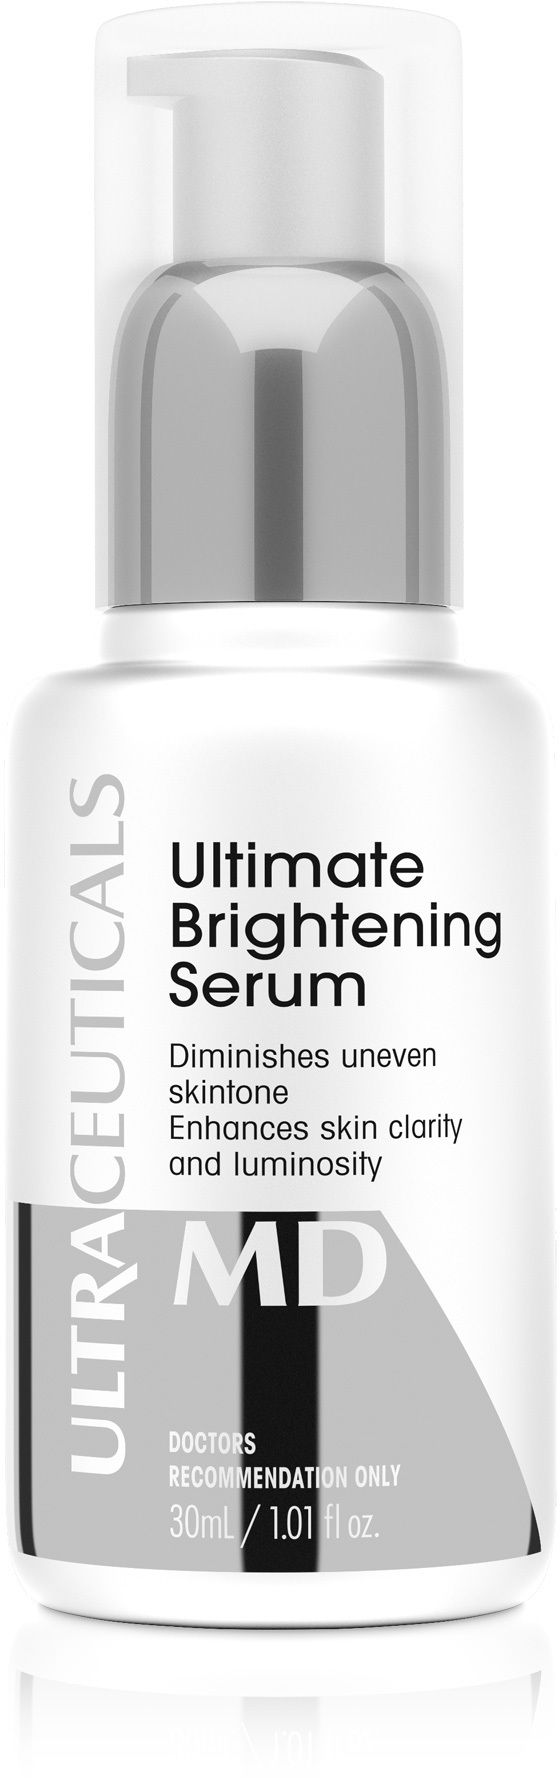 Ultraceuticals - Ultra MD Ultimate Brightening Serum Reviews | beautyheaven